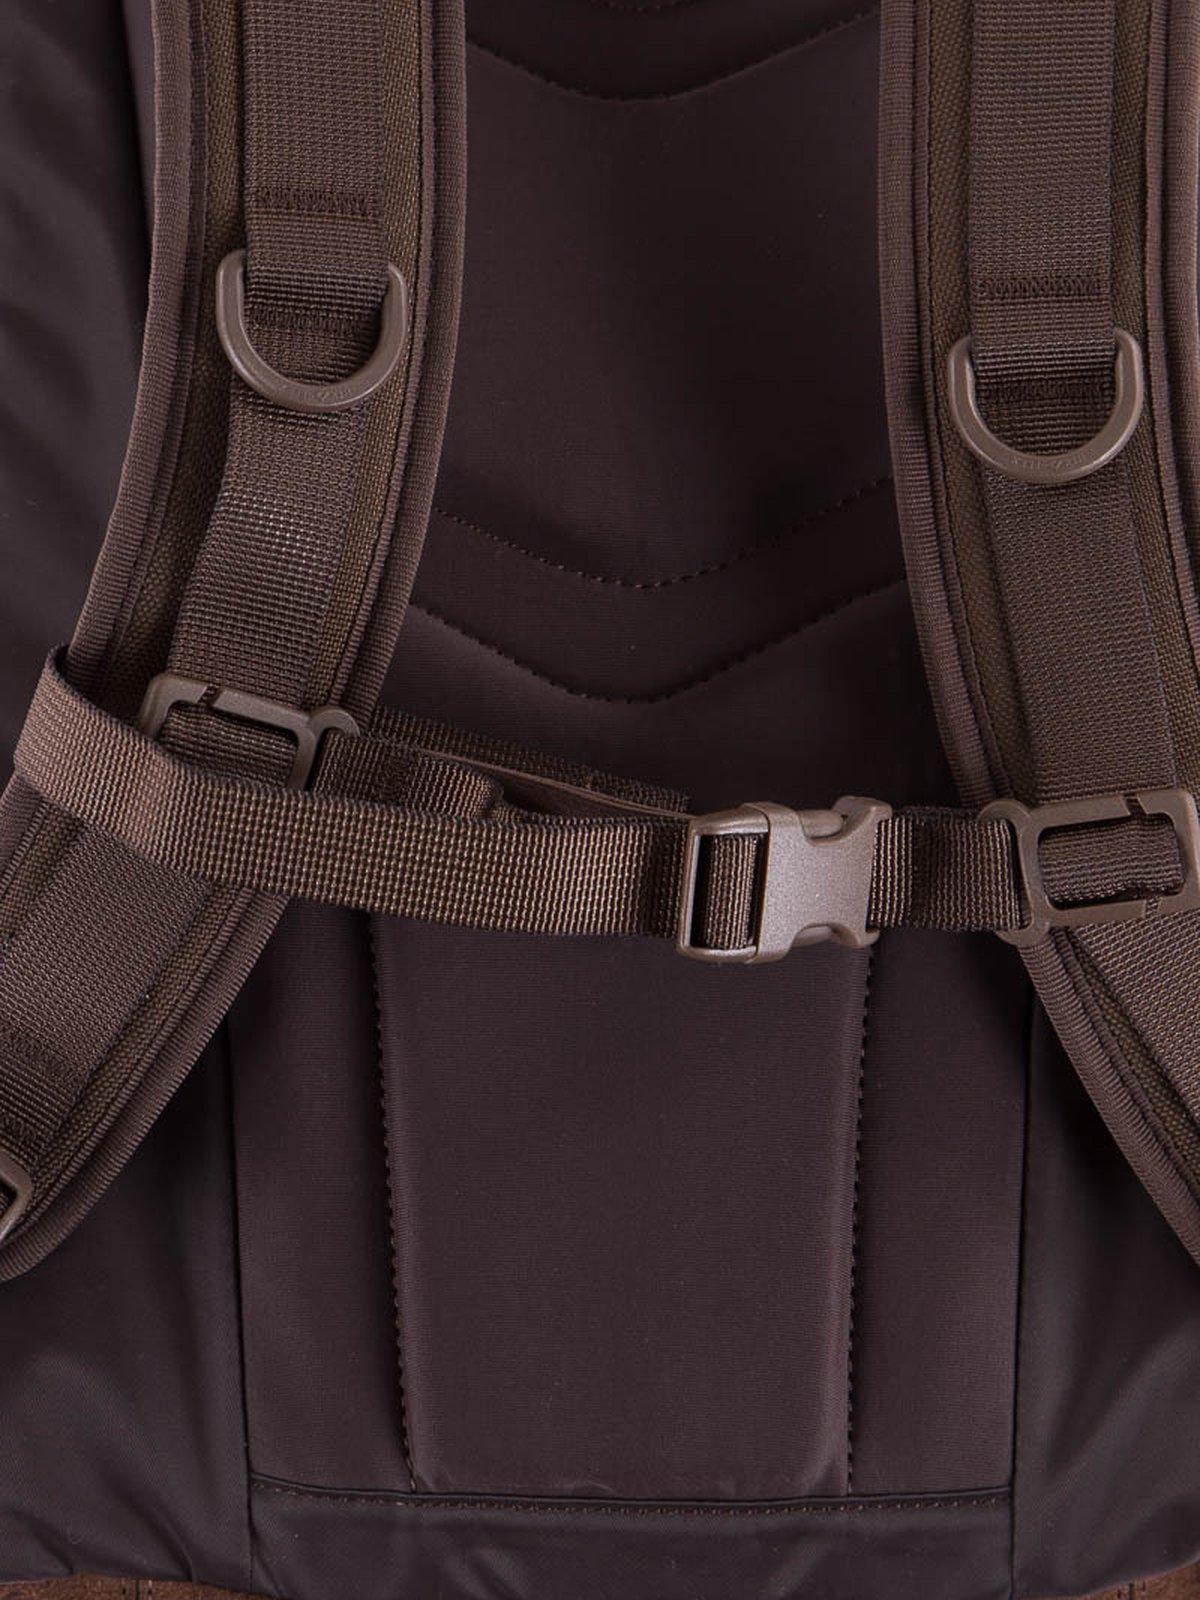 Brown 22L Ballistic Backpack - Image 6